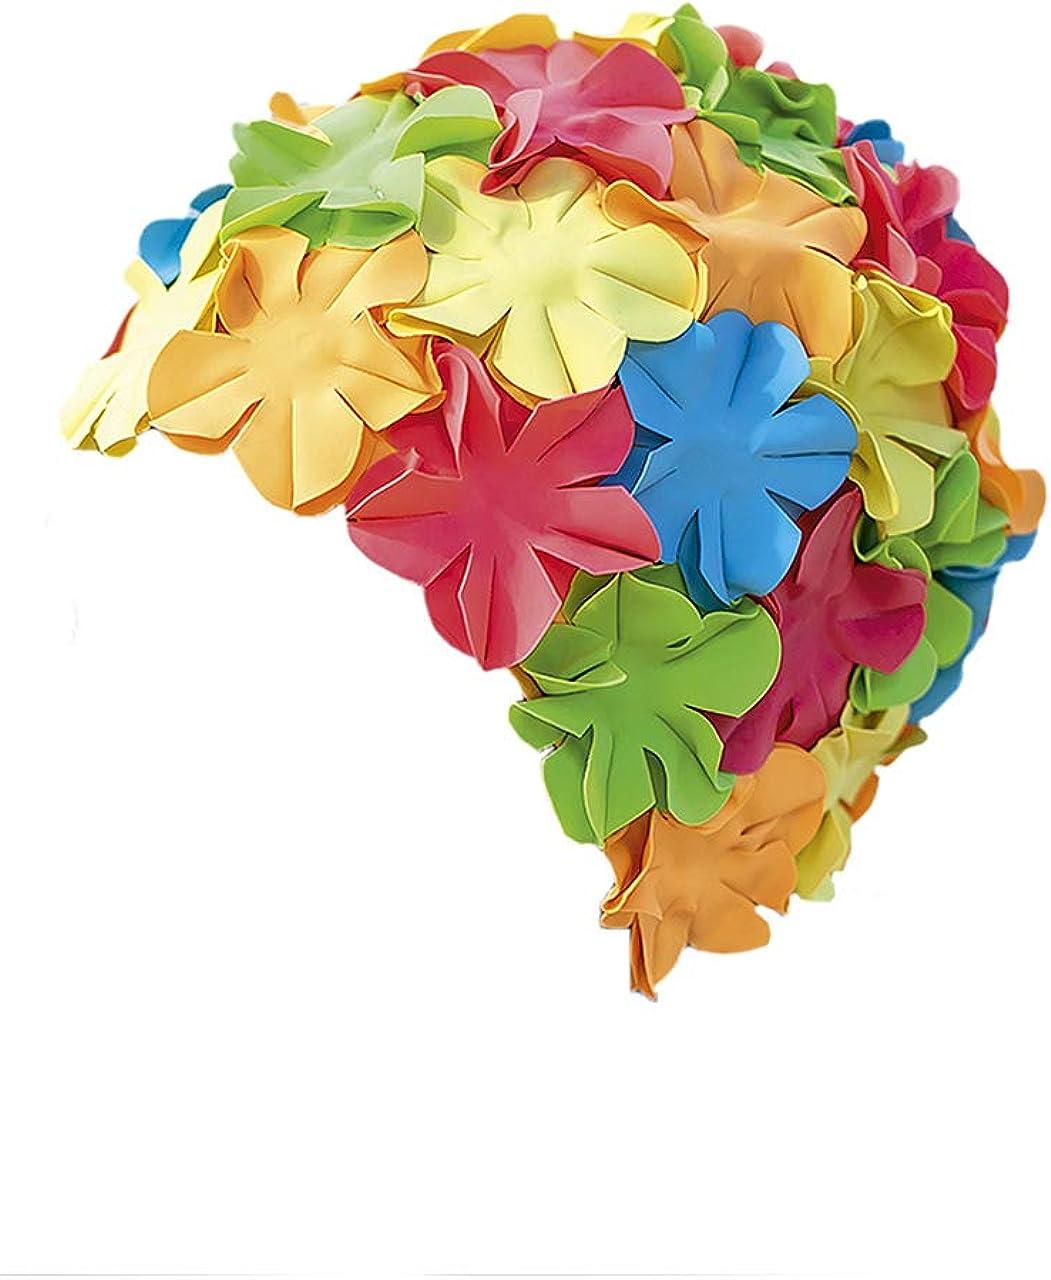 Fashy Multicoloured Petal Cap 3191 02